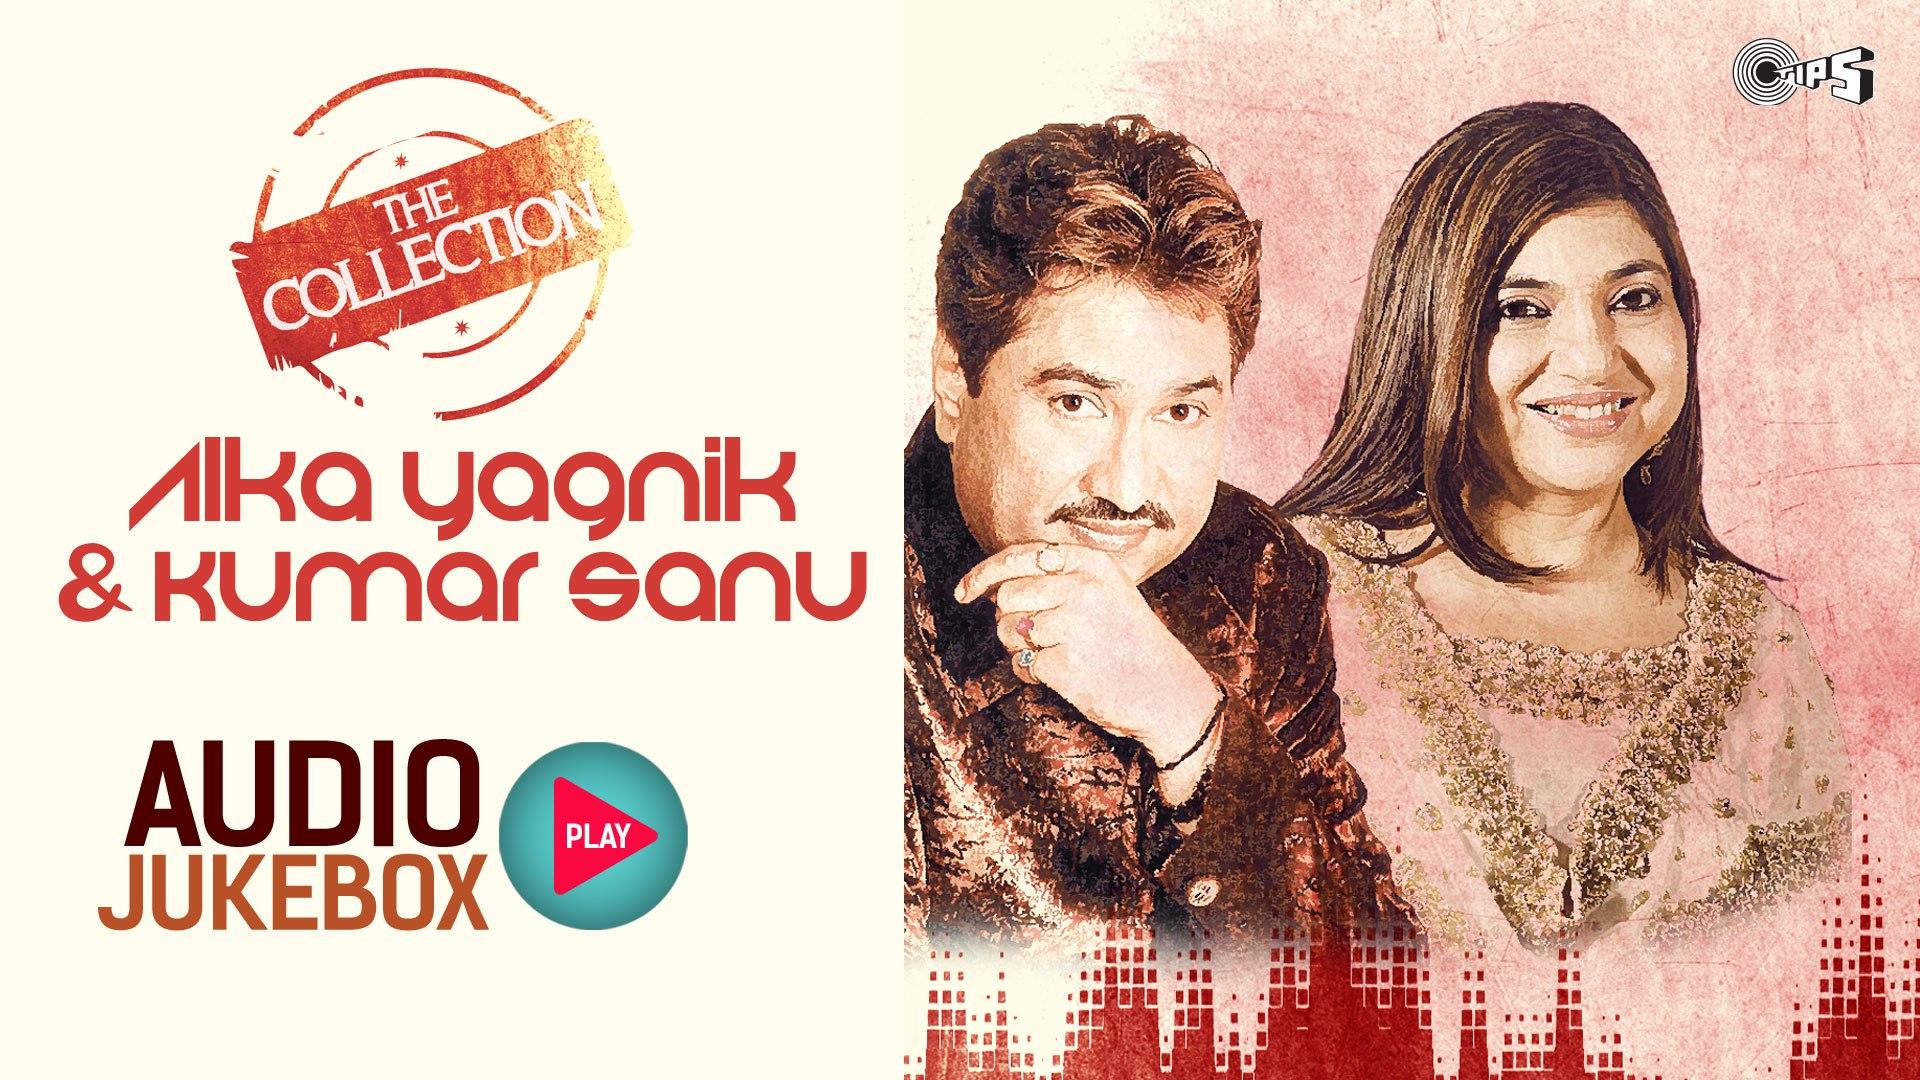 7a85449f8fd8 Kumar Sanu And Alka Yagnik Romantic Songs Collection | Full Songs Audio  Jukebox